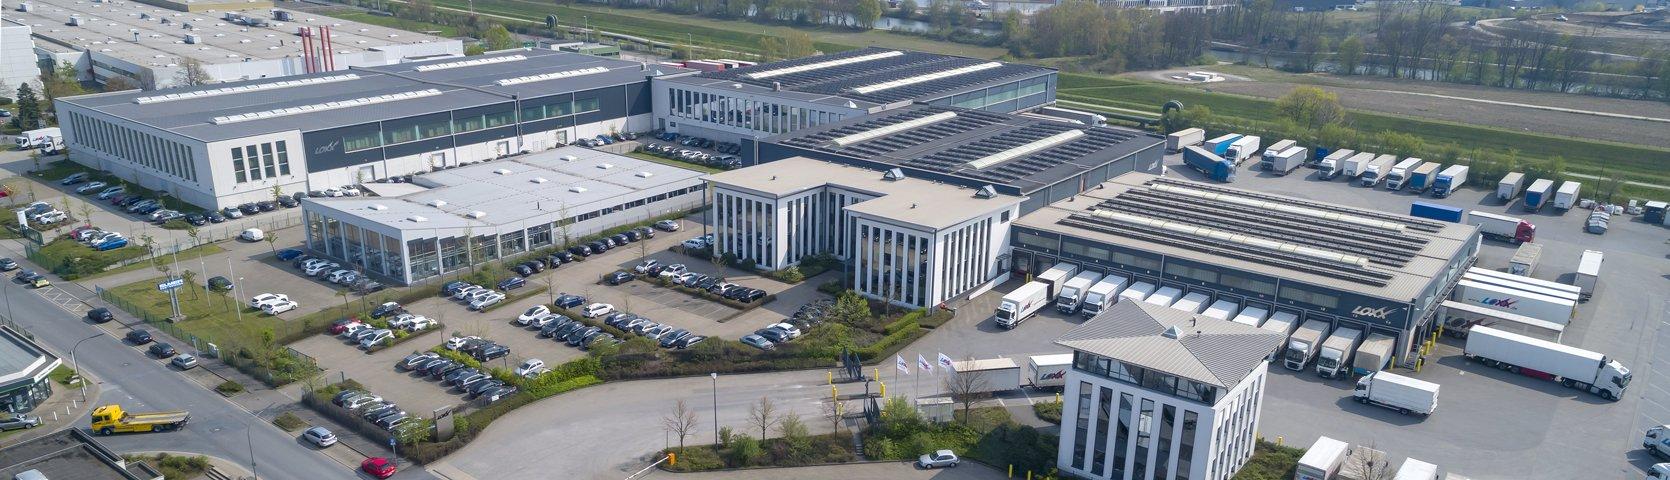 LOXX Holding GmbH